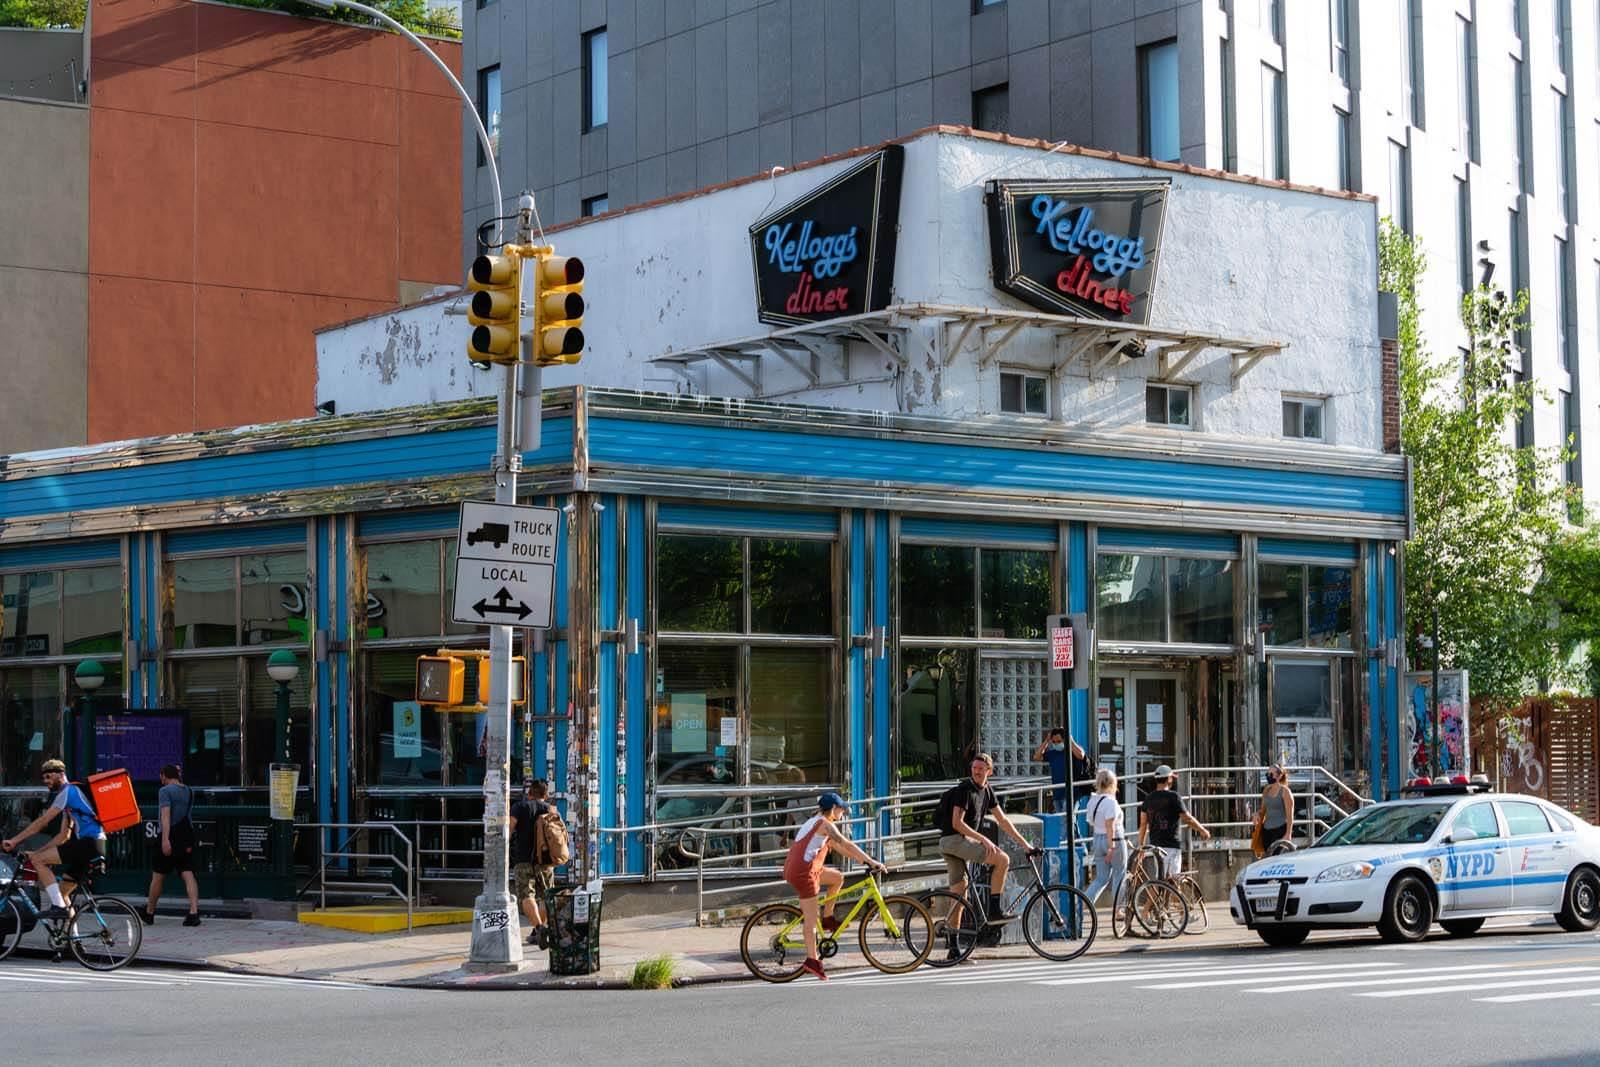 Kellogs Diner in Brooklyn located in Williamsburg